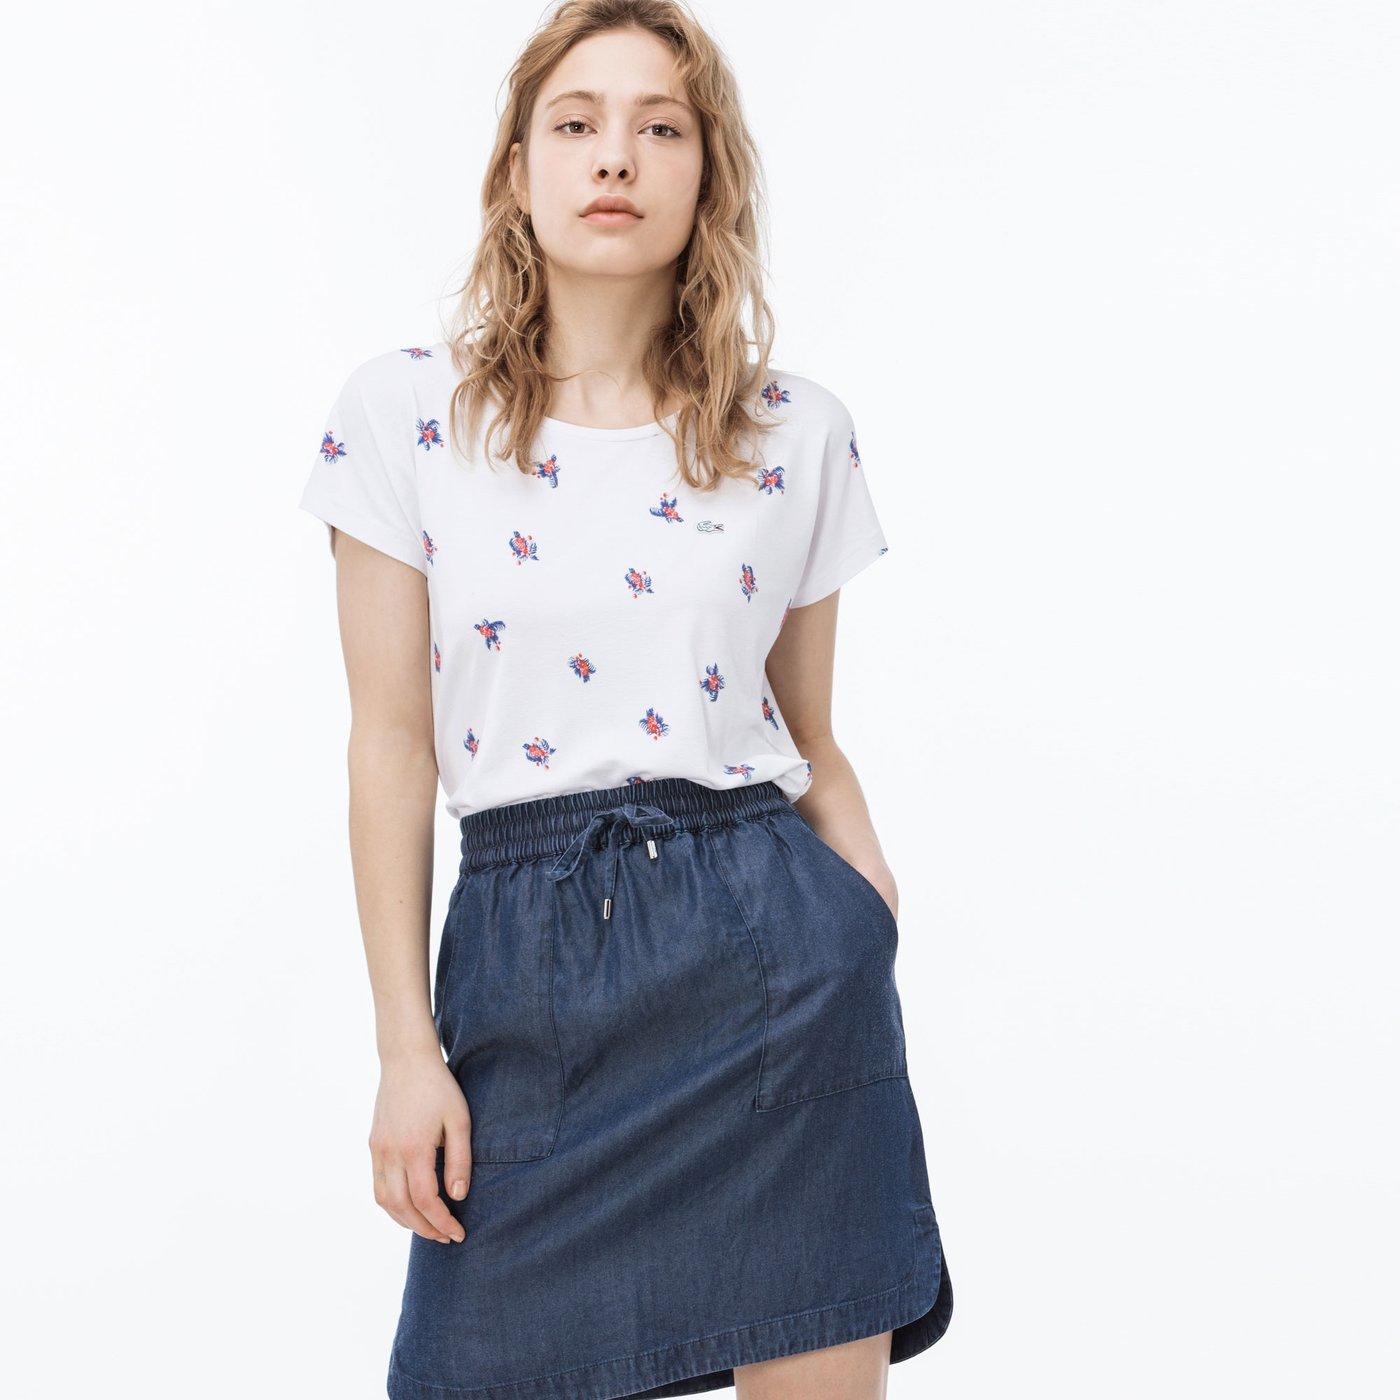 Lacoste Kadın Renkli T-Shirt